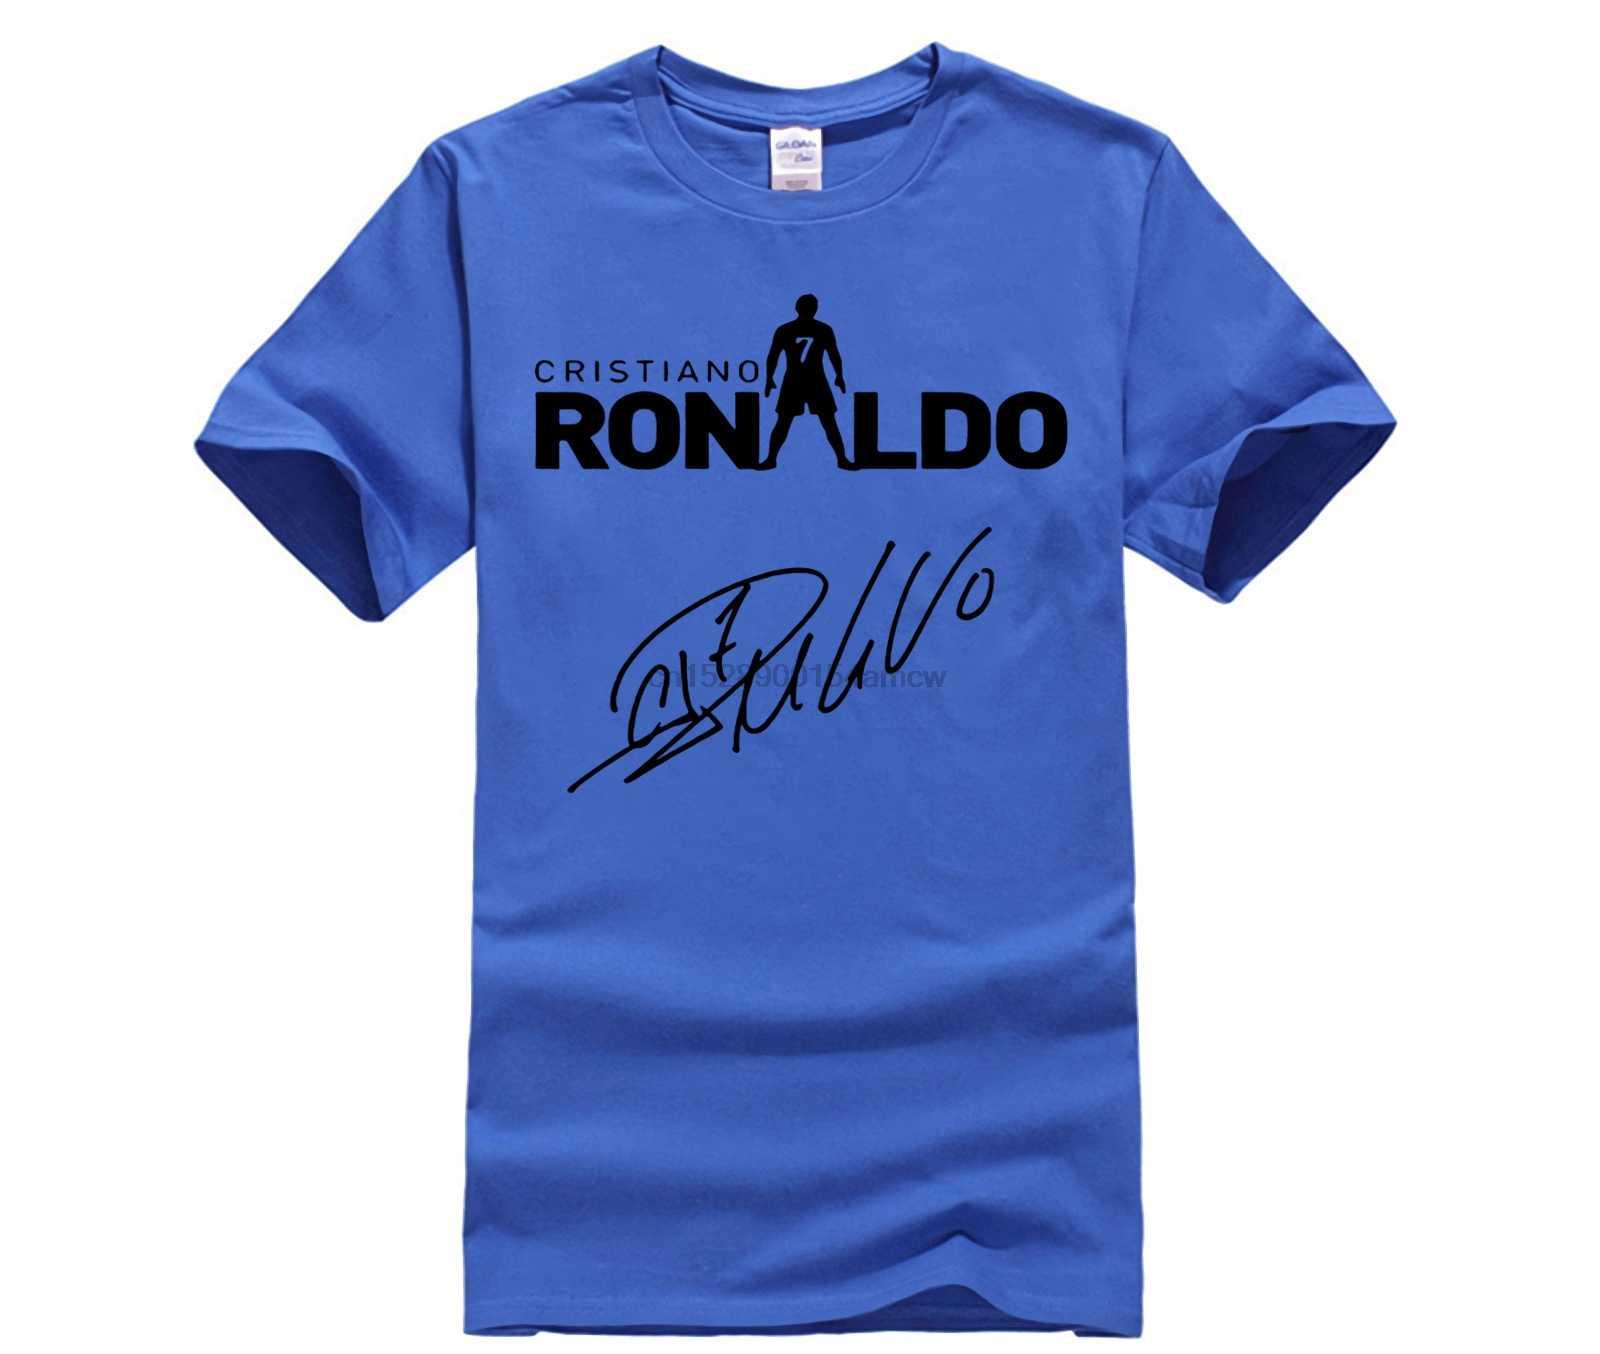 Cristiano ronaldo signé CR7 t-shirt cool T-shirts hommes col rond mode T-shirts fans cadeau